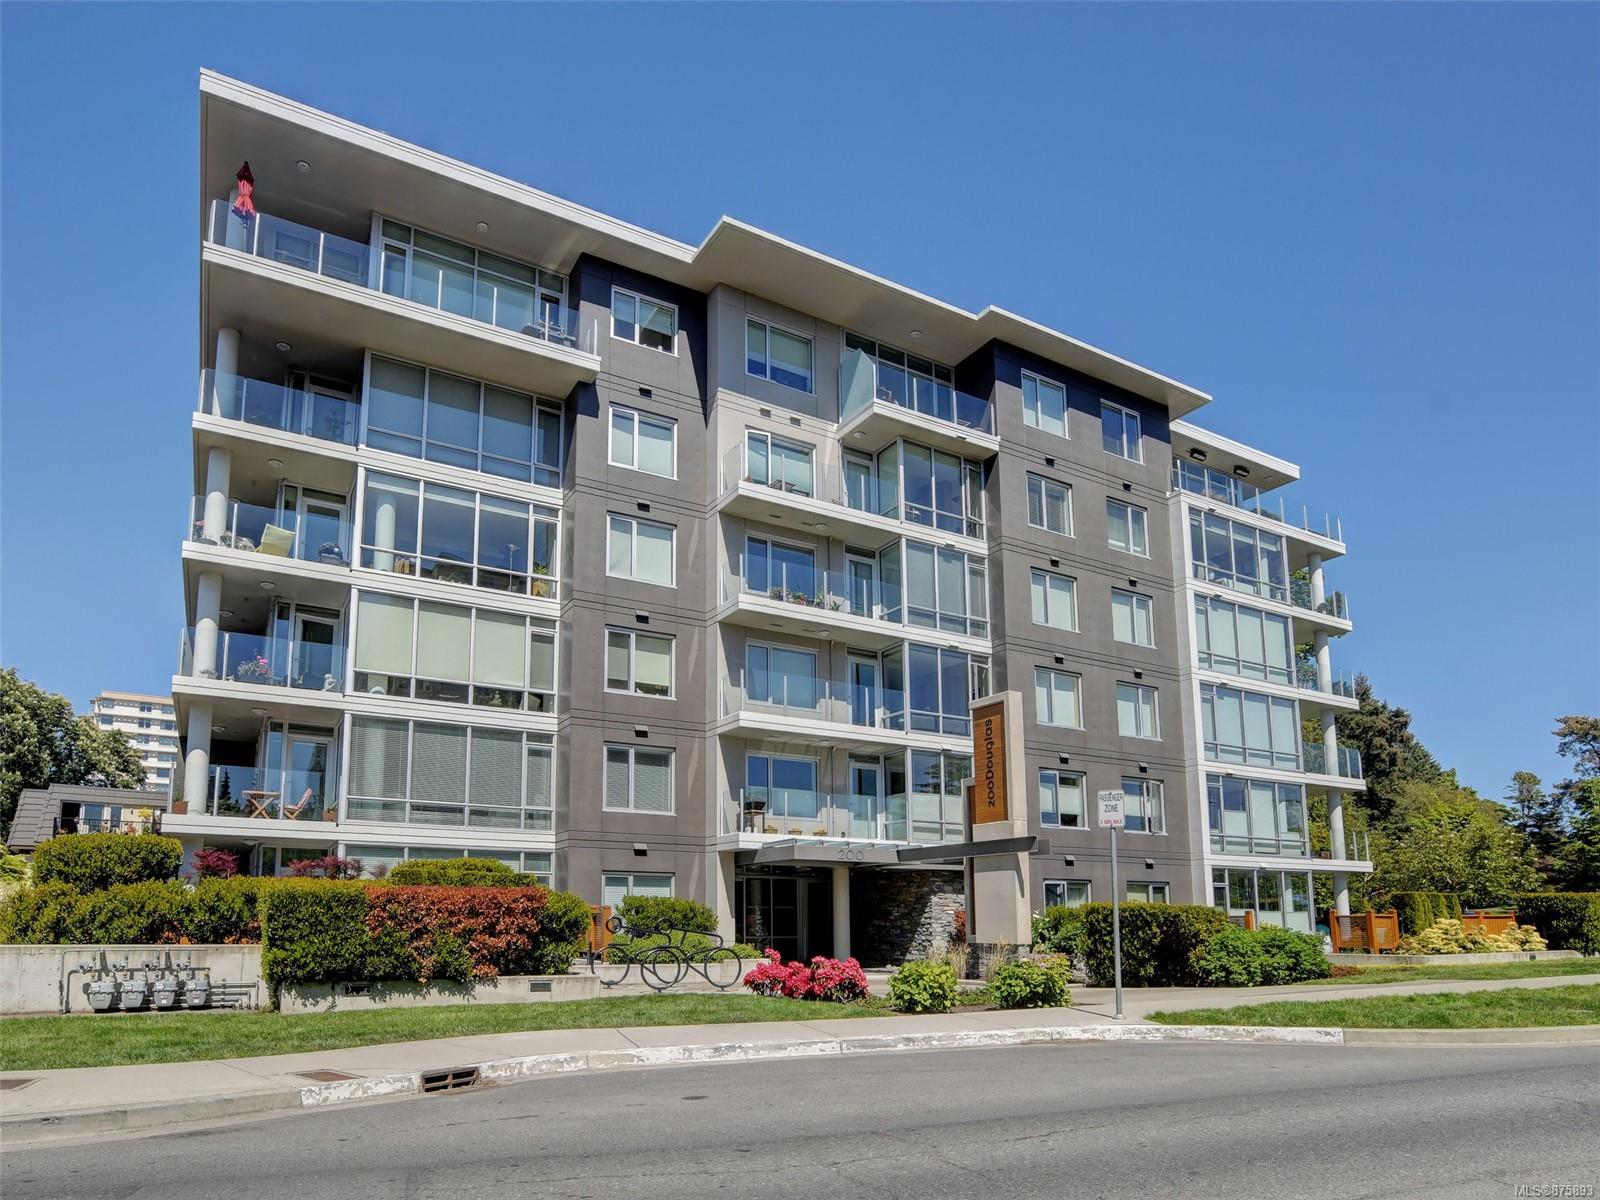 104 - 200 Douglas Street, James Bay, Victoria photo number 2